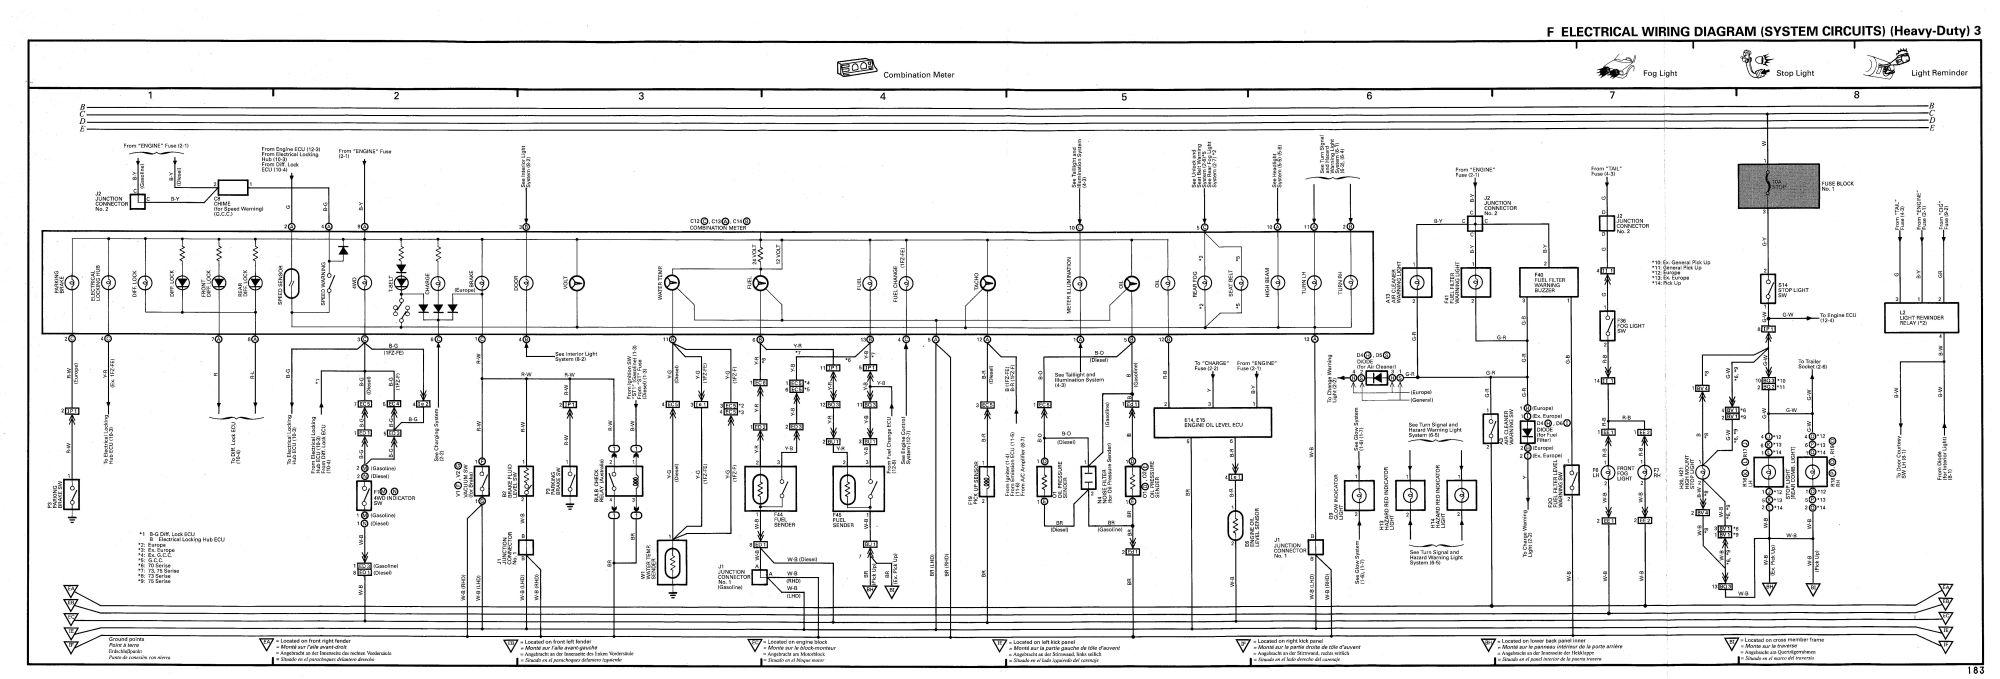 hight resolution of land cruiser wiring diagram wiring diagram operations toyota land cruiser 100 series wiring diagram wiring diagram